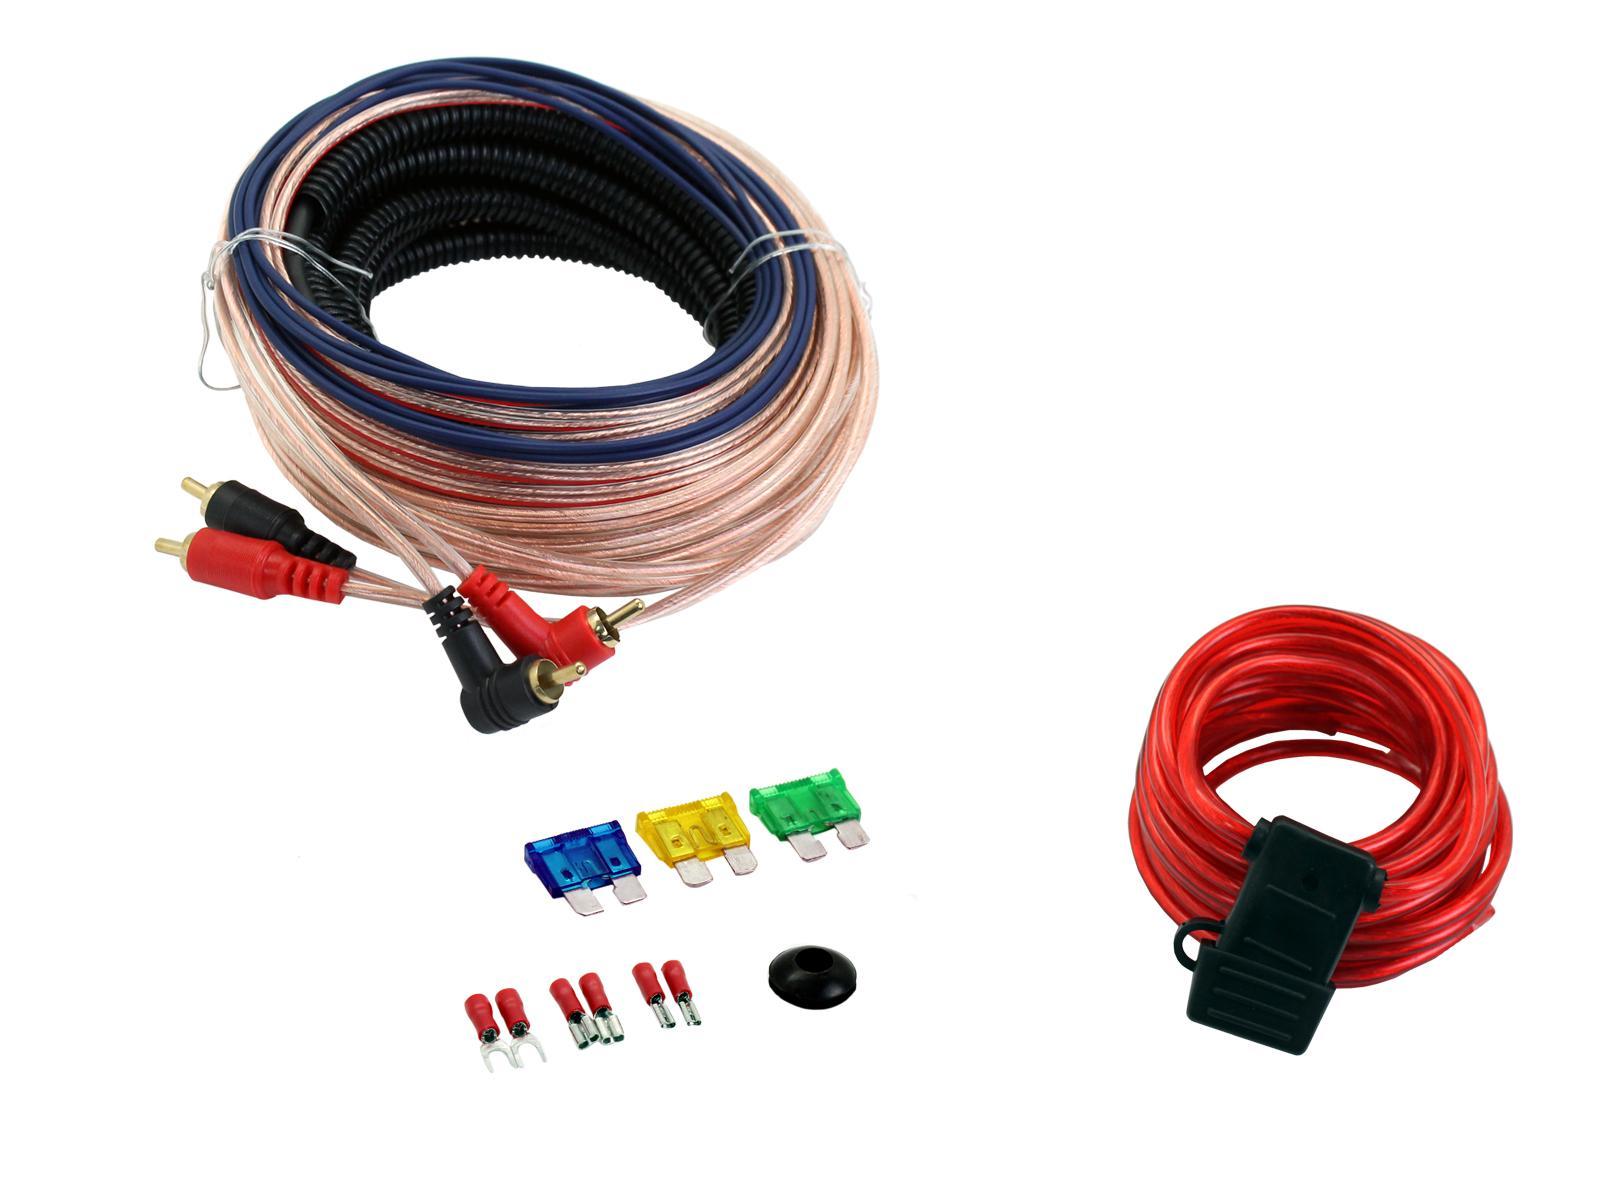 Vehicle Parts & Accessories CONNECTS 2 PRO 4 AWG 1000 WATT ... on 1000 watt amplifier wiring kit, 1000 watt stereo amp, 1000 watt sub, 1000 watt monoblock amplifier, 1000 watt amplifier for car, kit car wiring kit, 1000 watt speakers, 1000 watt car amp, volkswagen complete wiring kit, 600 watt amp install kit, 1000 watt mono amp, 1000 watt stereo amplifier,